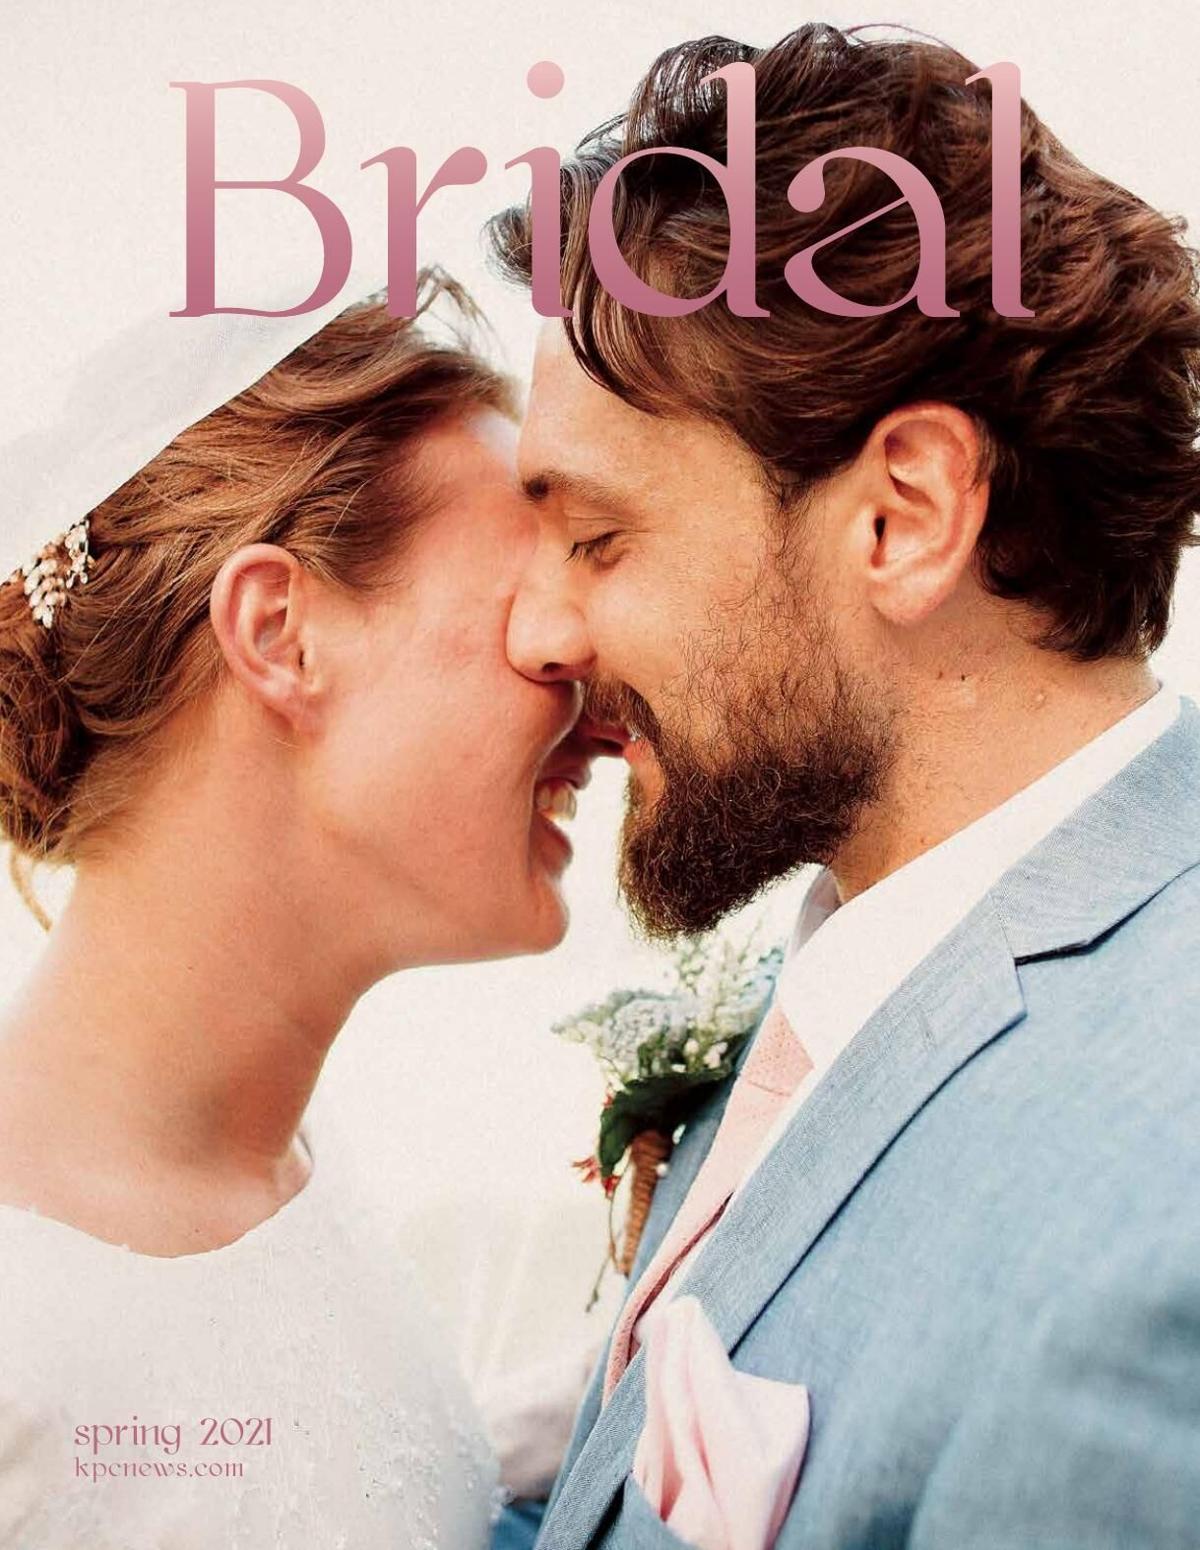 Bridal Guide Spring 2021